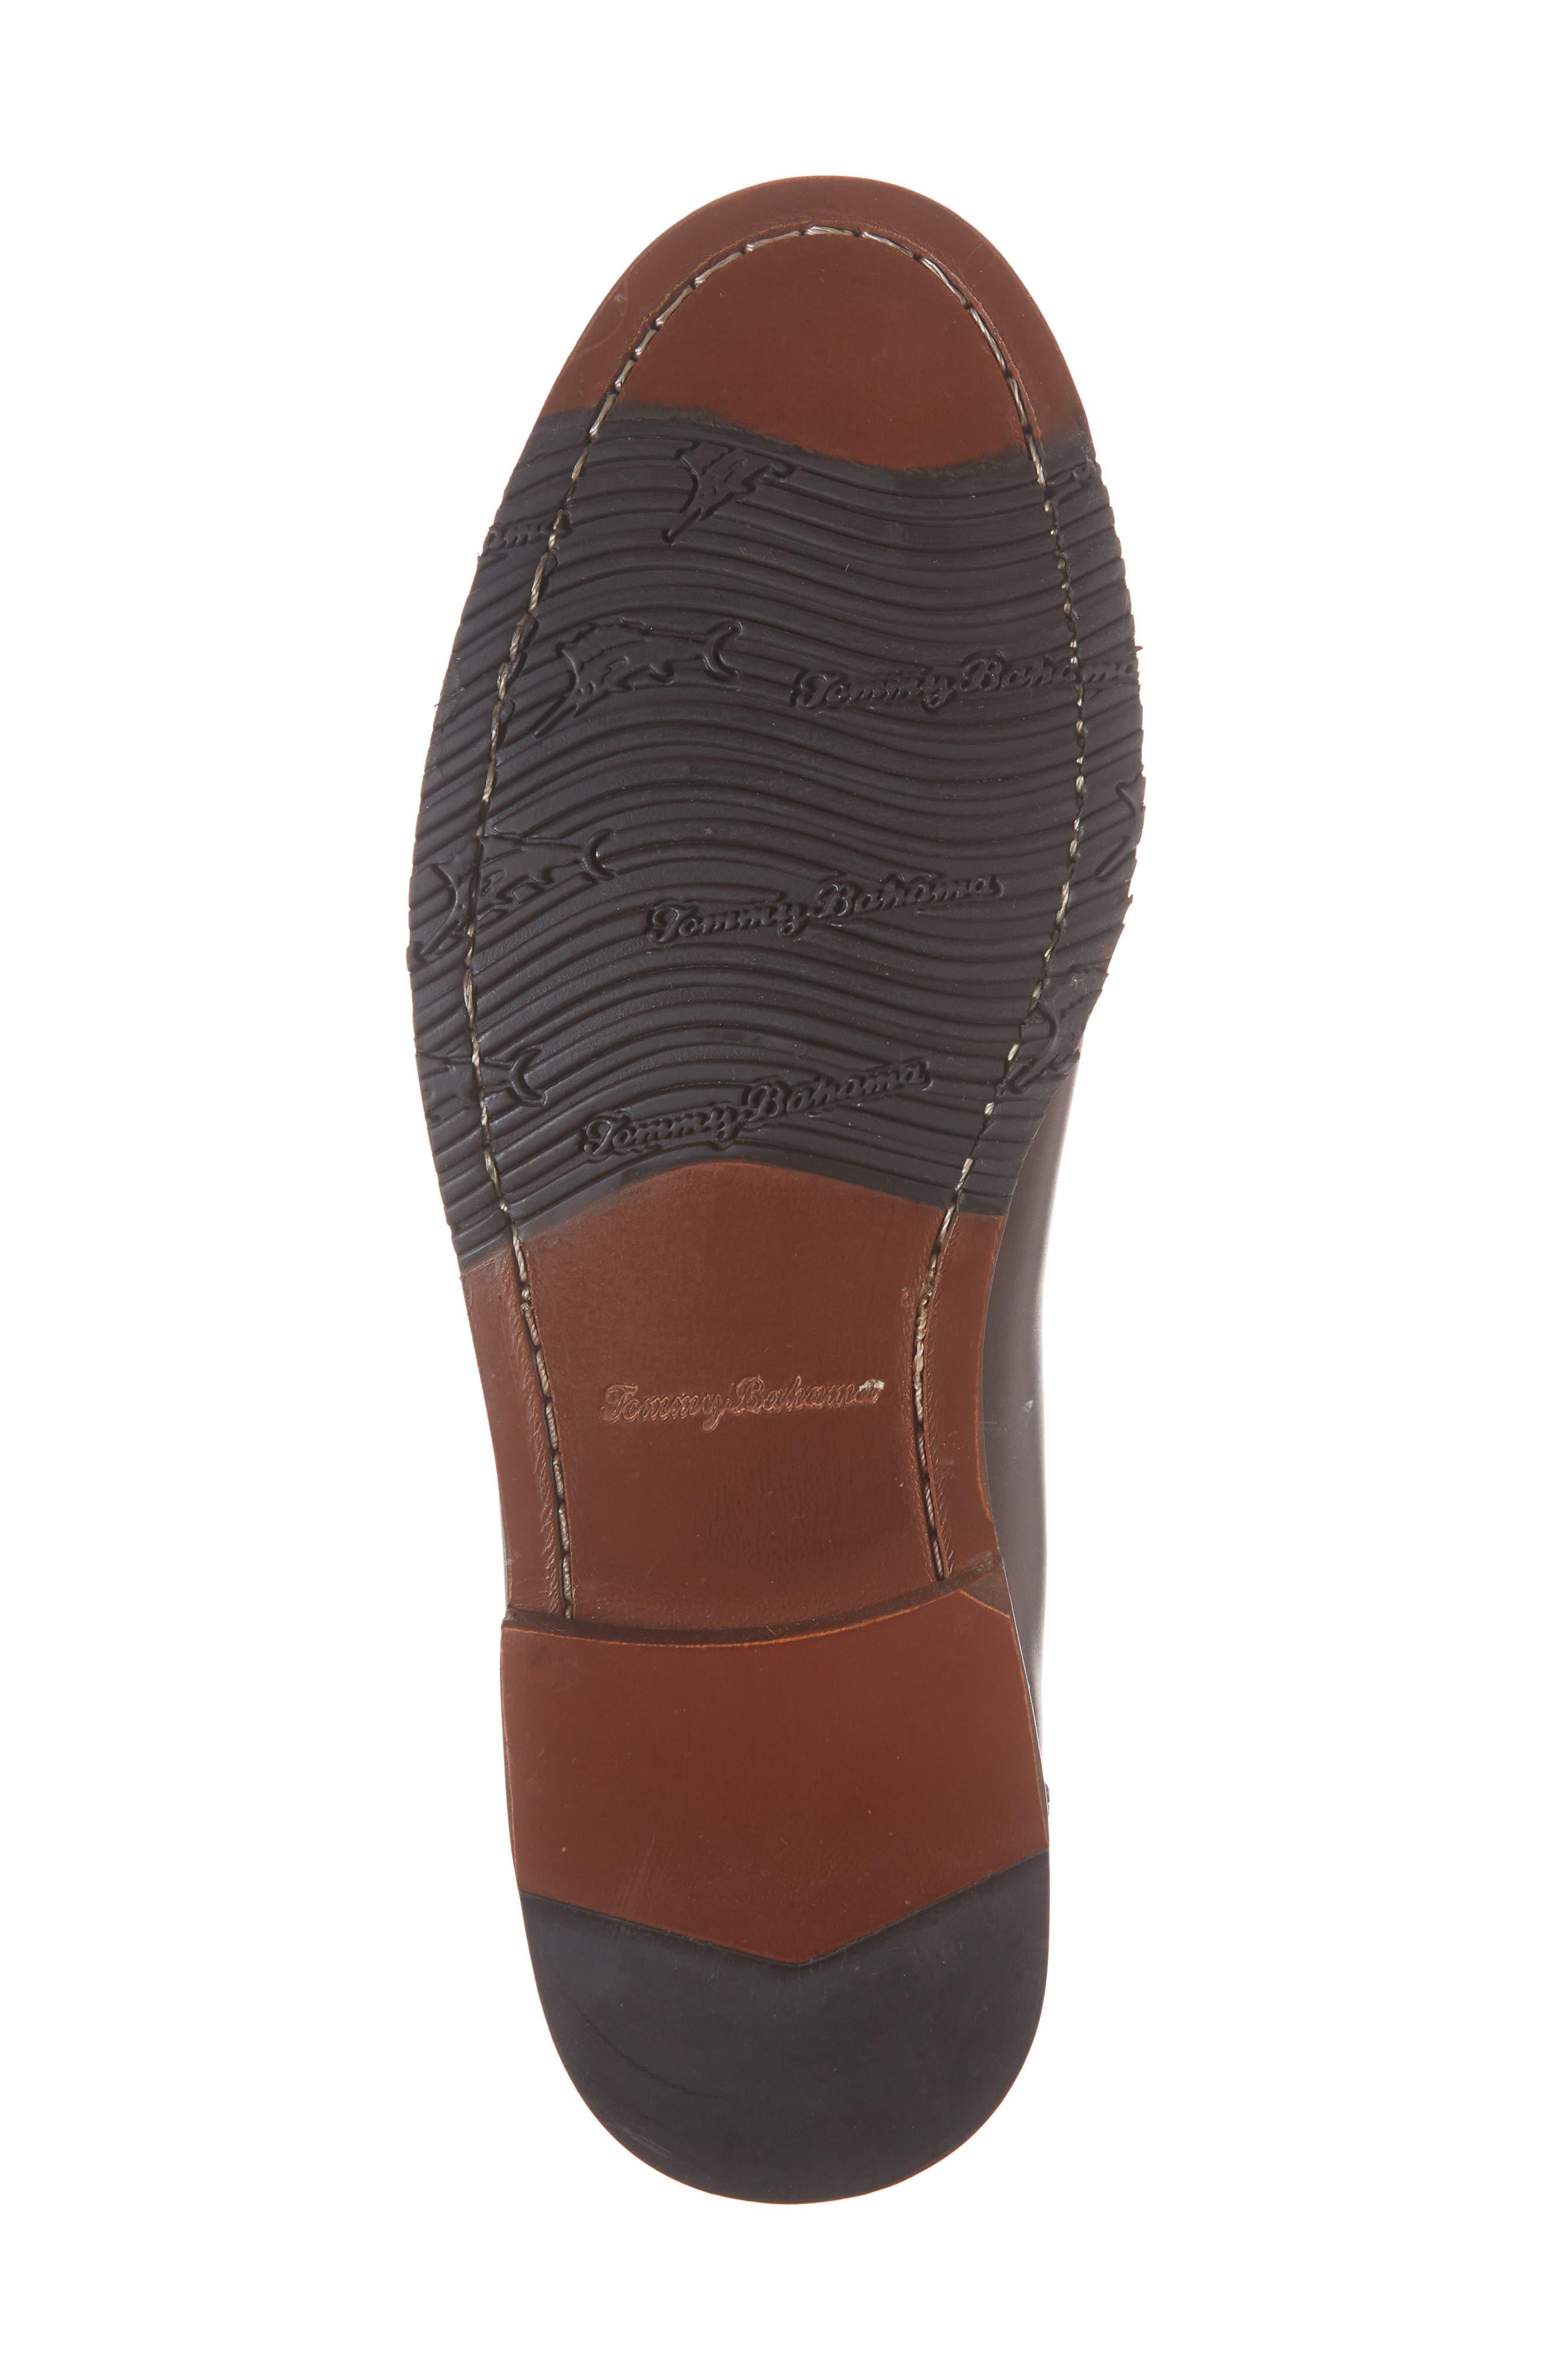 Tasslington Loafer,                             Alternate thumbnail 4, color,                             Dark Brown Leather